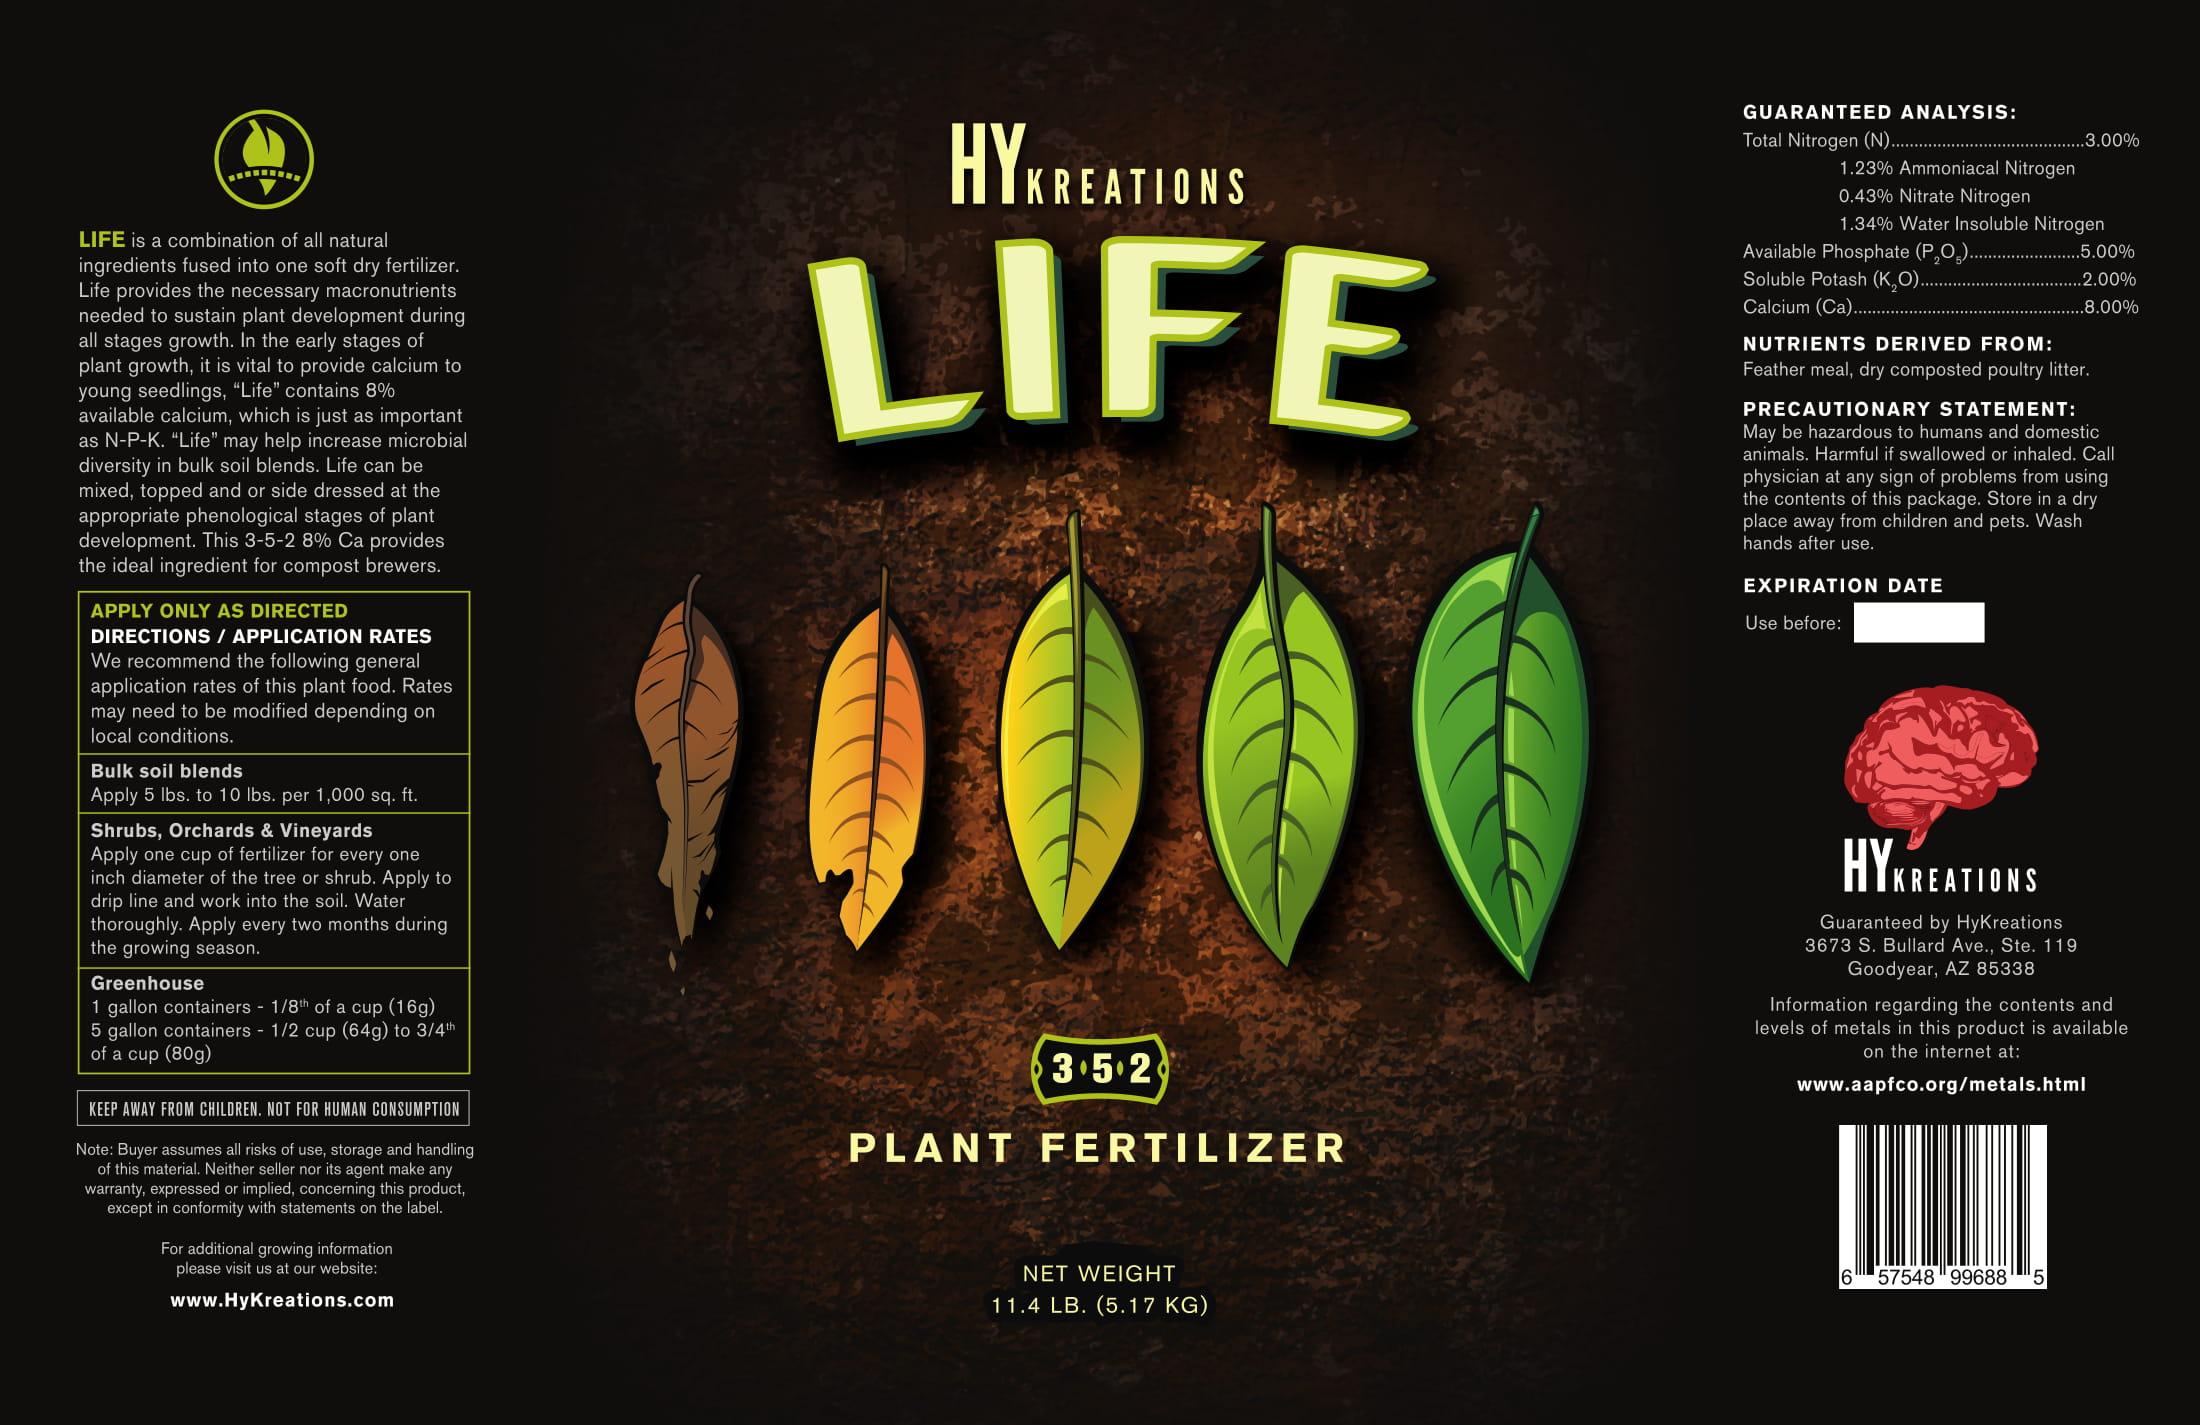 HyKreations Label (Life) (1)-1.jpg